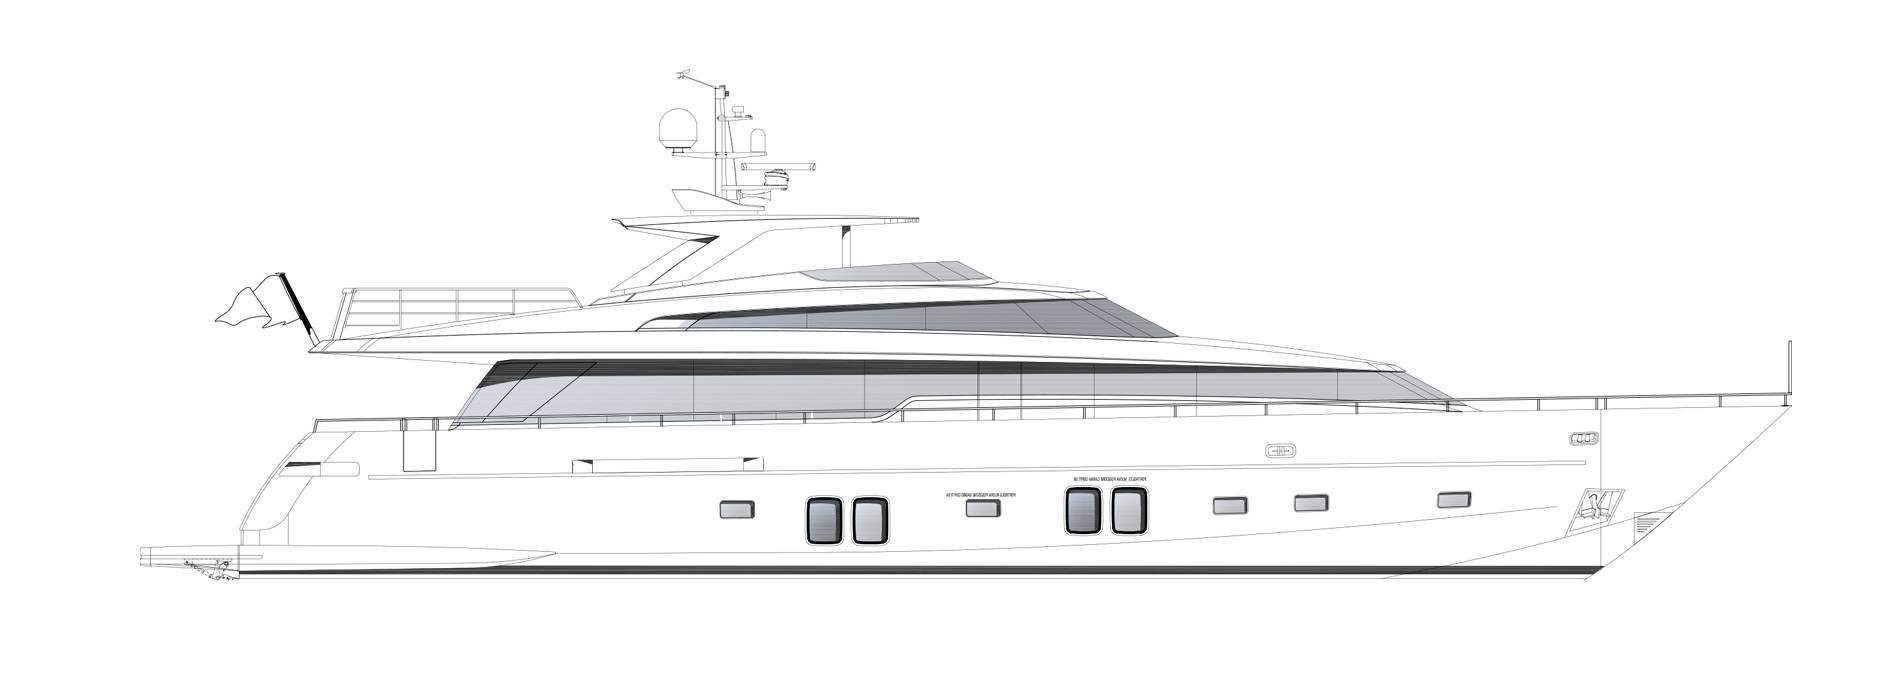 Sanlorenzo Yachts SL96-684 Профиль